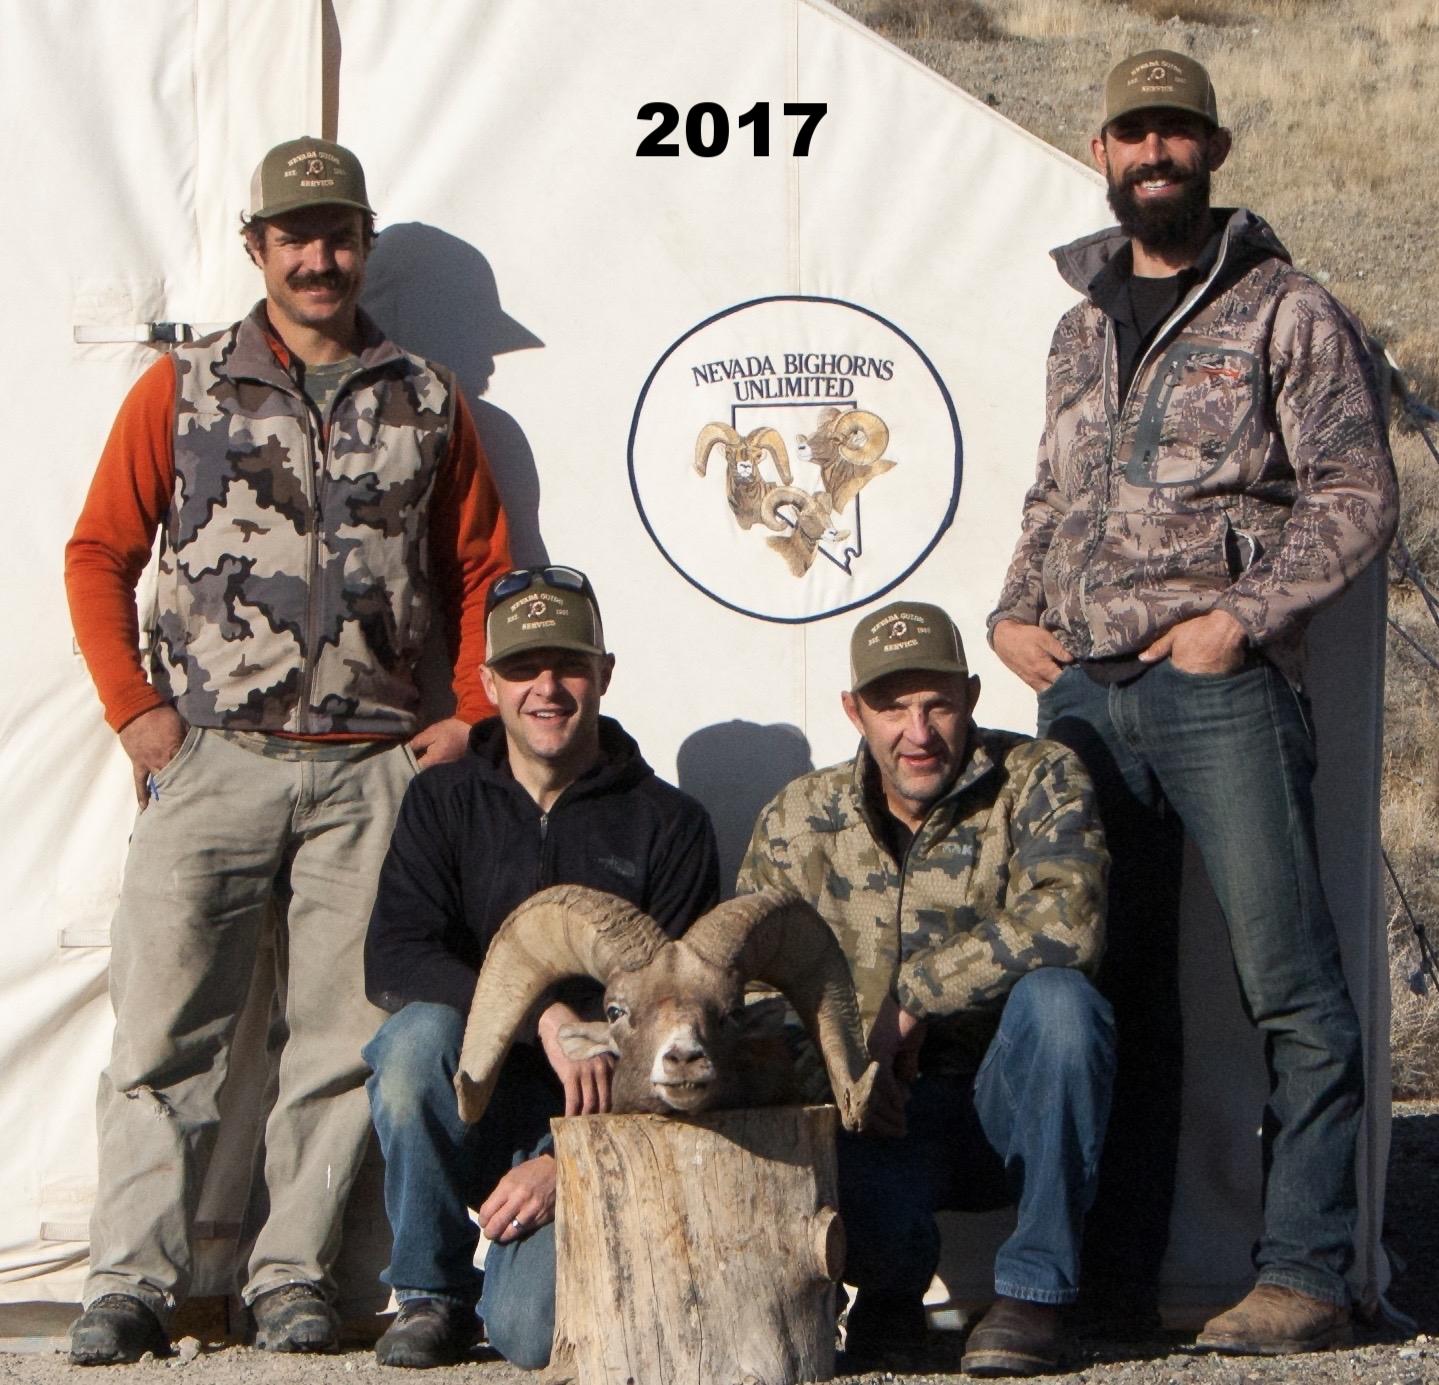 big-horn-sheep-hunt2.jpg